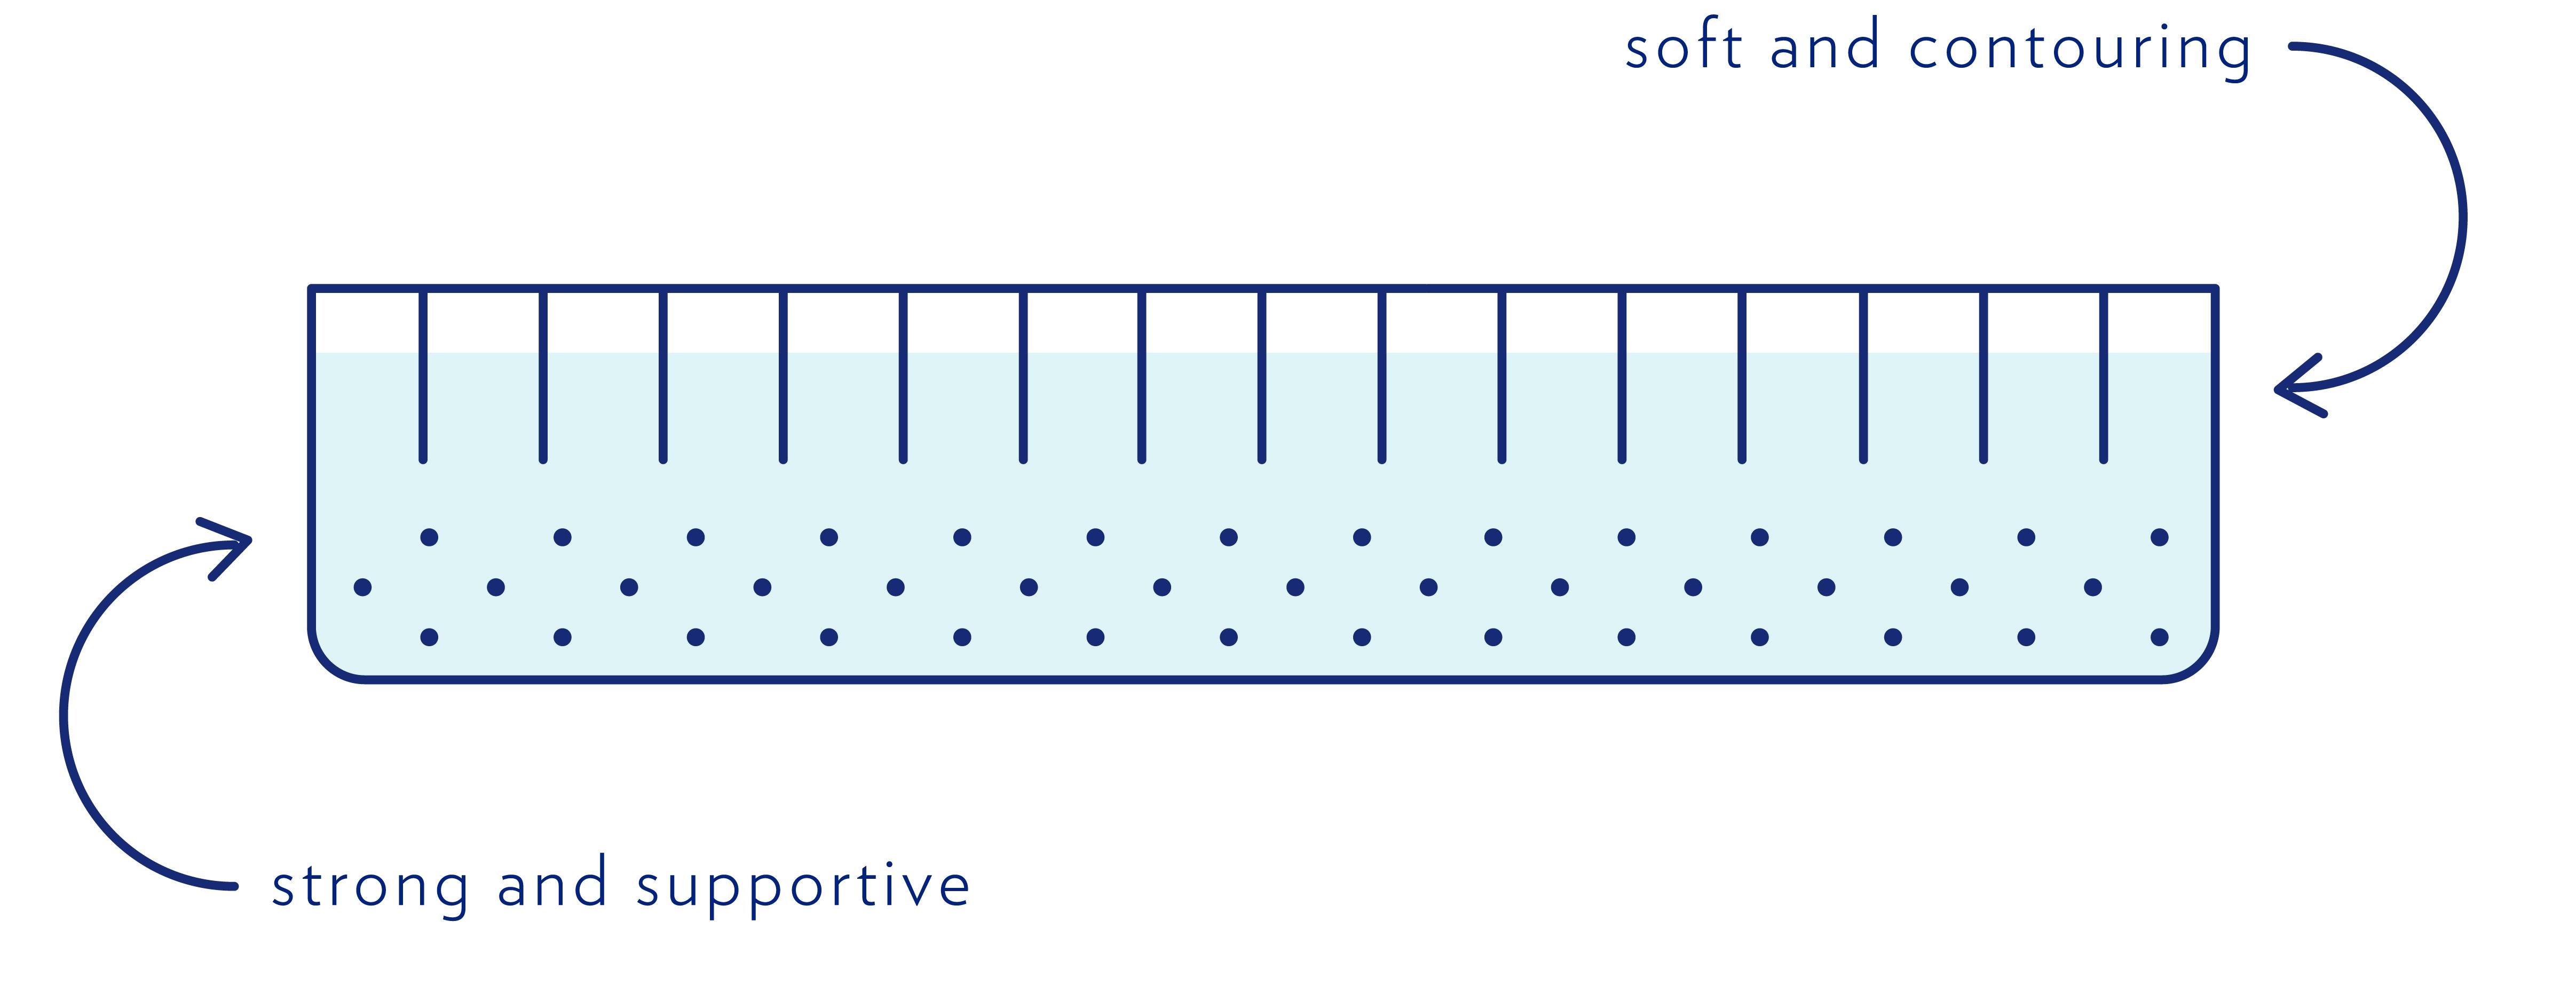 types of mattresses a casper mattress comparison caspera